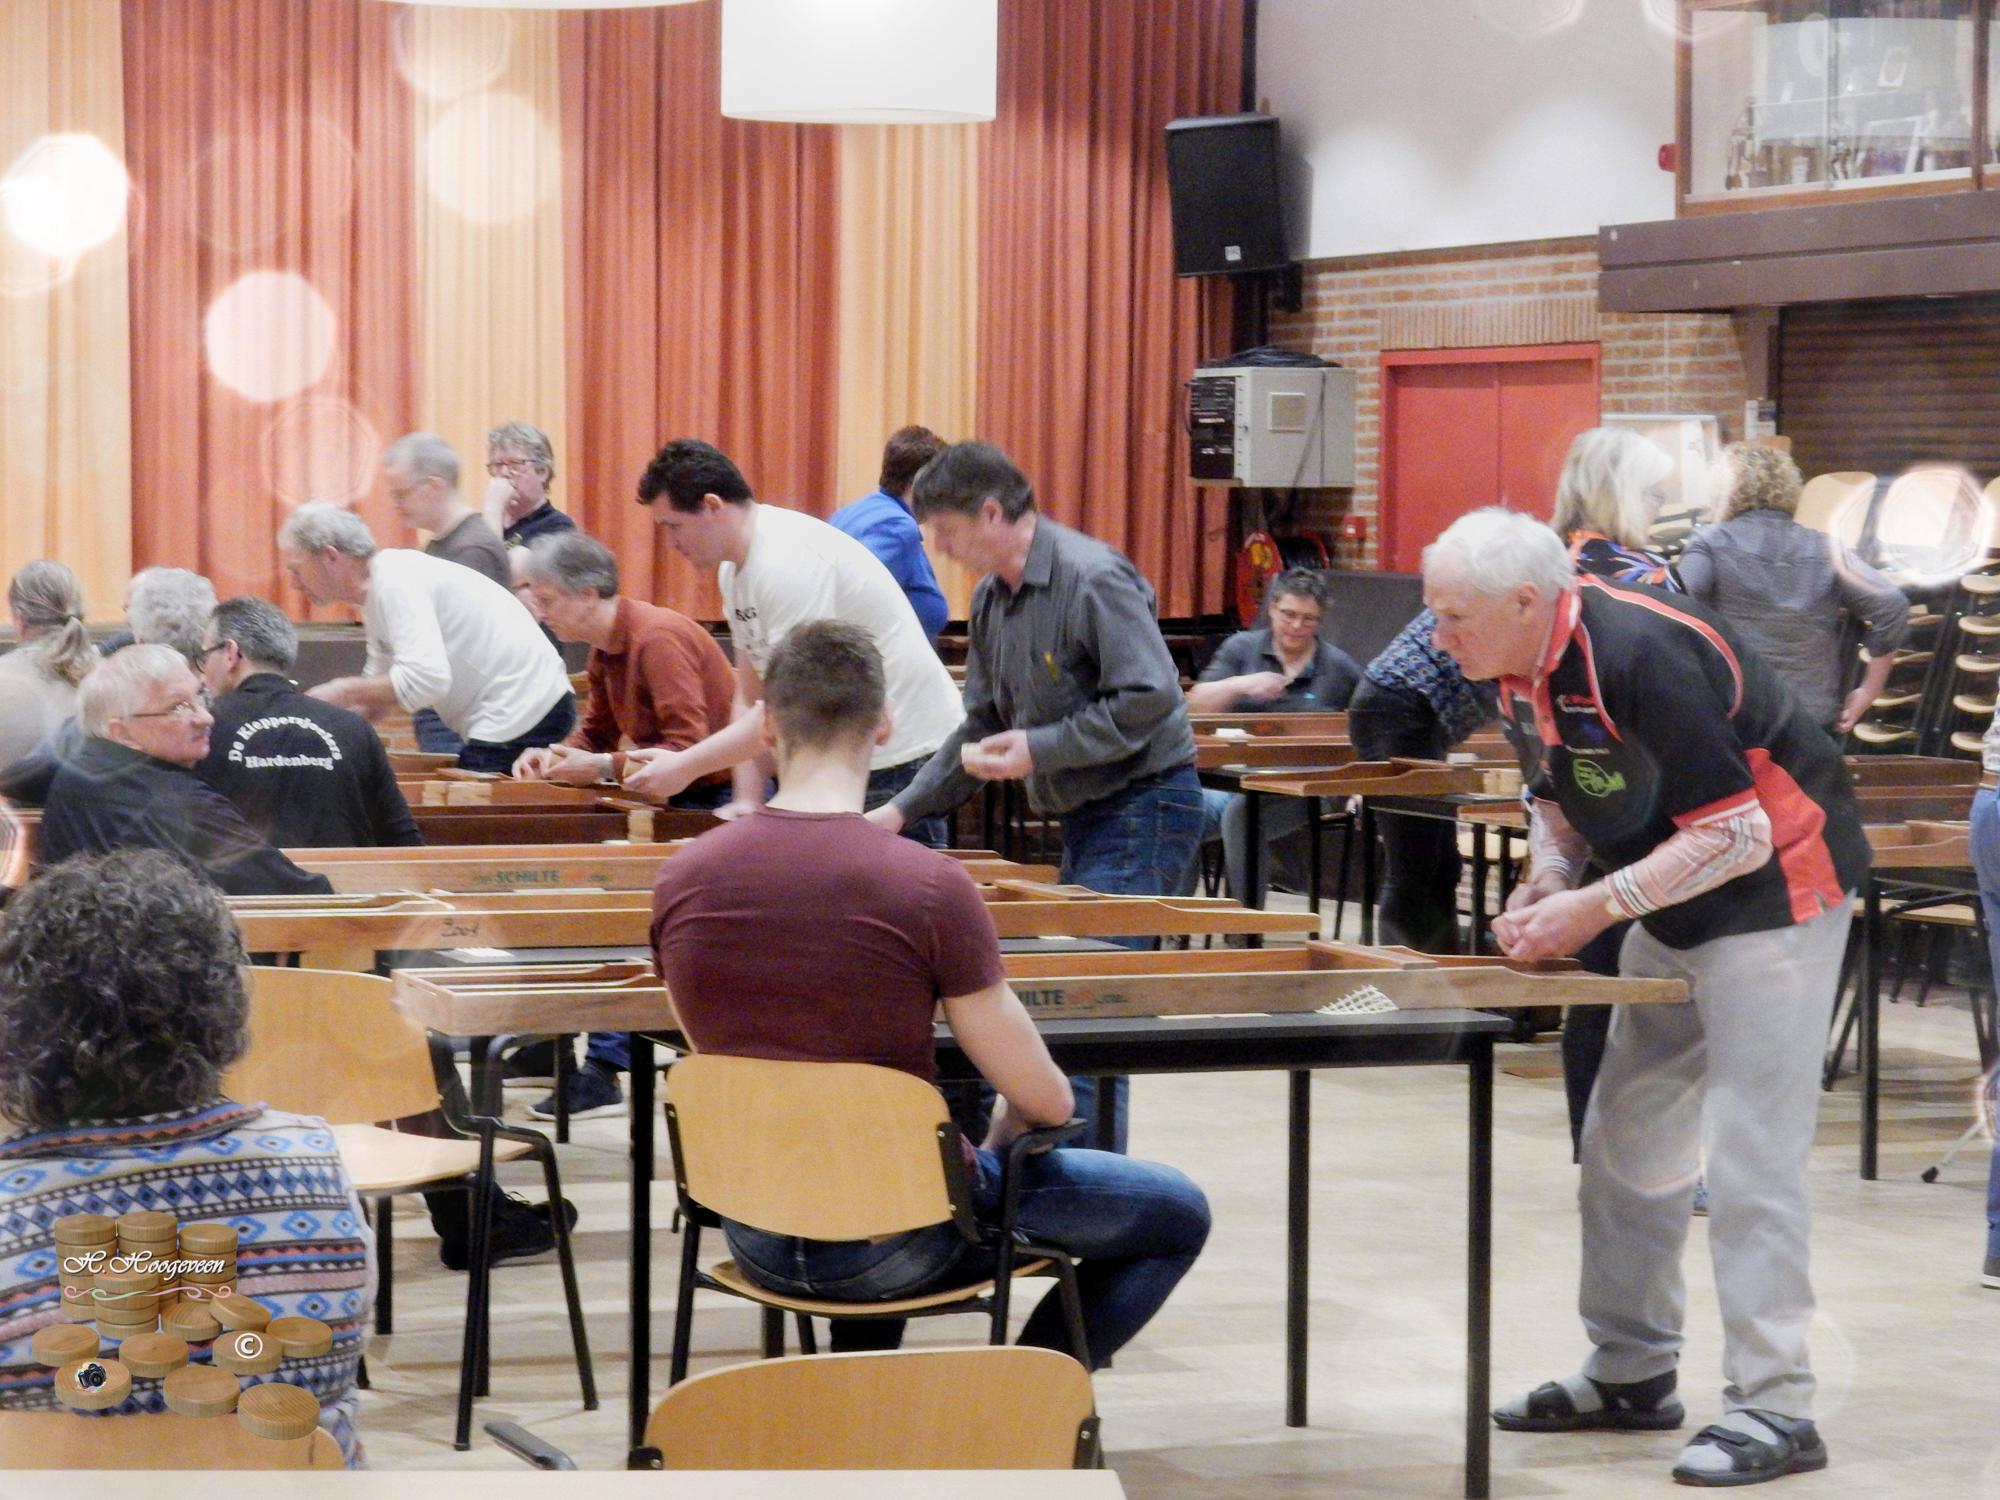 Bekerwedstrijd-Zwolle-31-03-2018 (39)